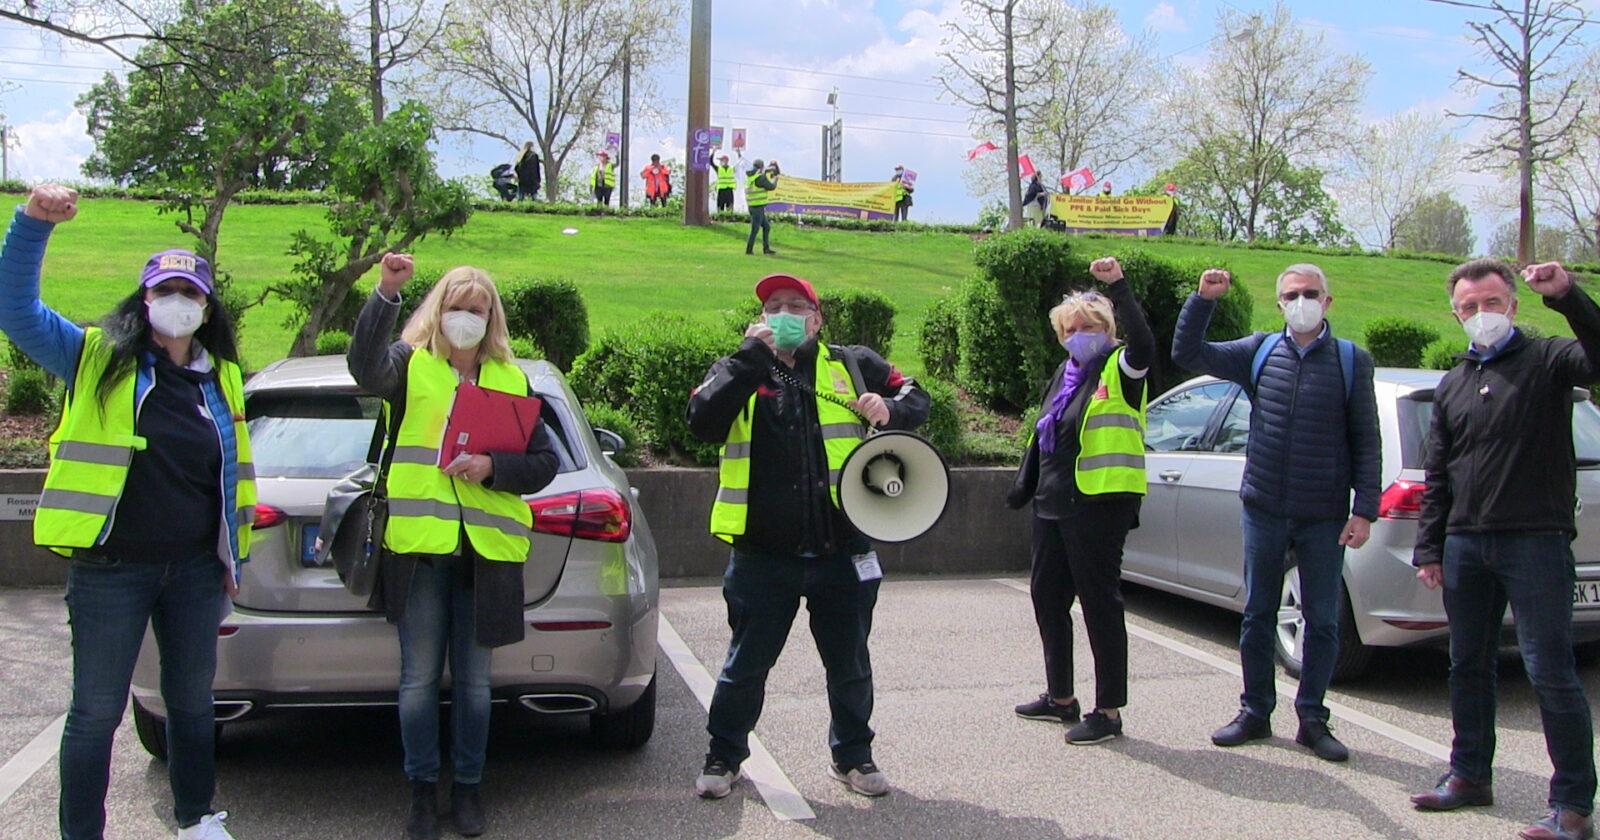 Video: IG BAU - SEIU Solidaritätsaktion am Sitz der Firma MANN in Karlsruhe